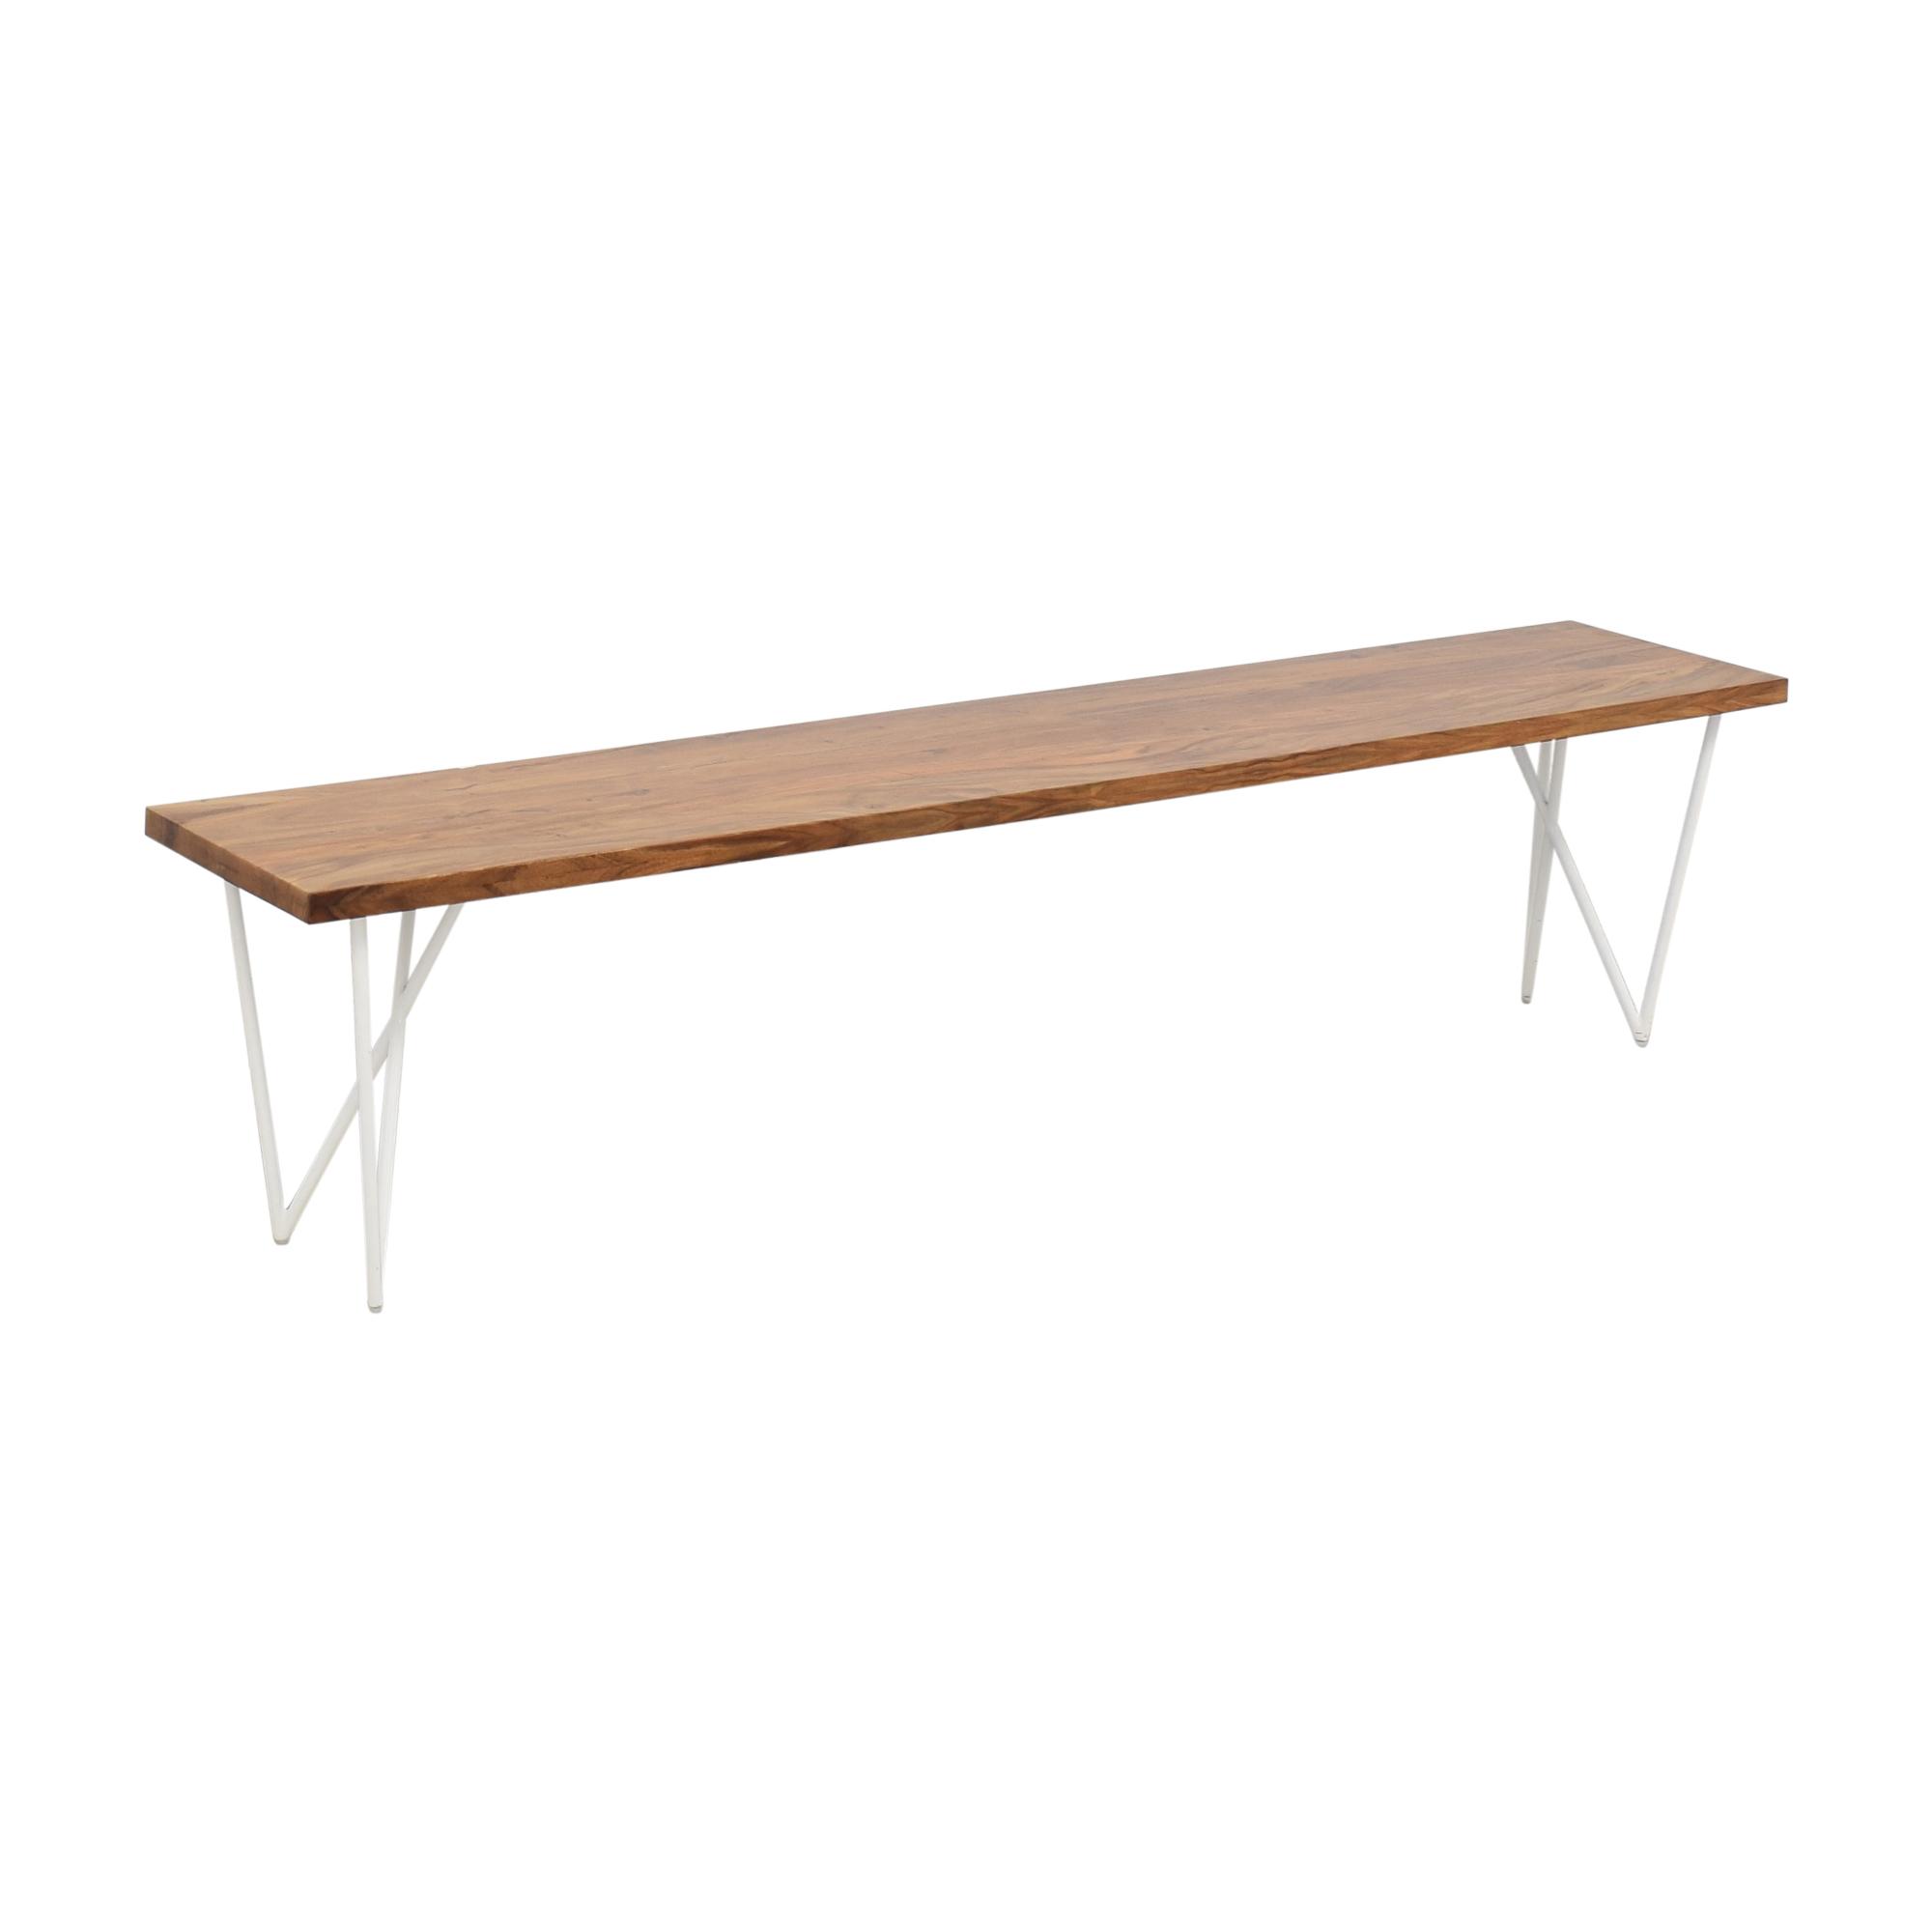 CB2 CB2 Wood Bench nyc